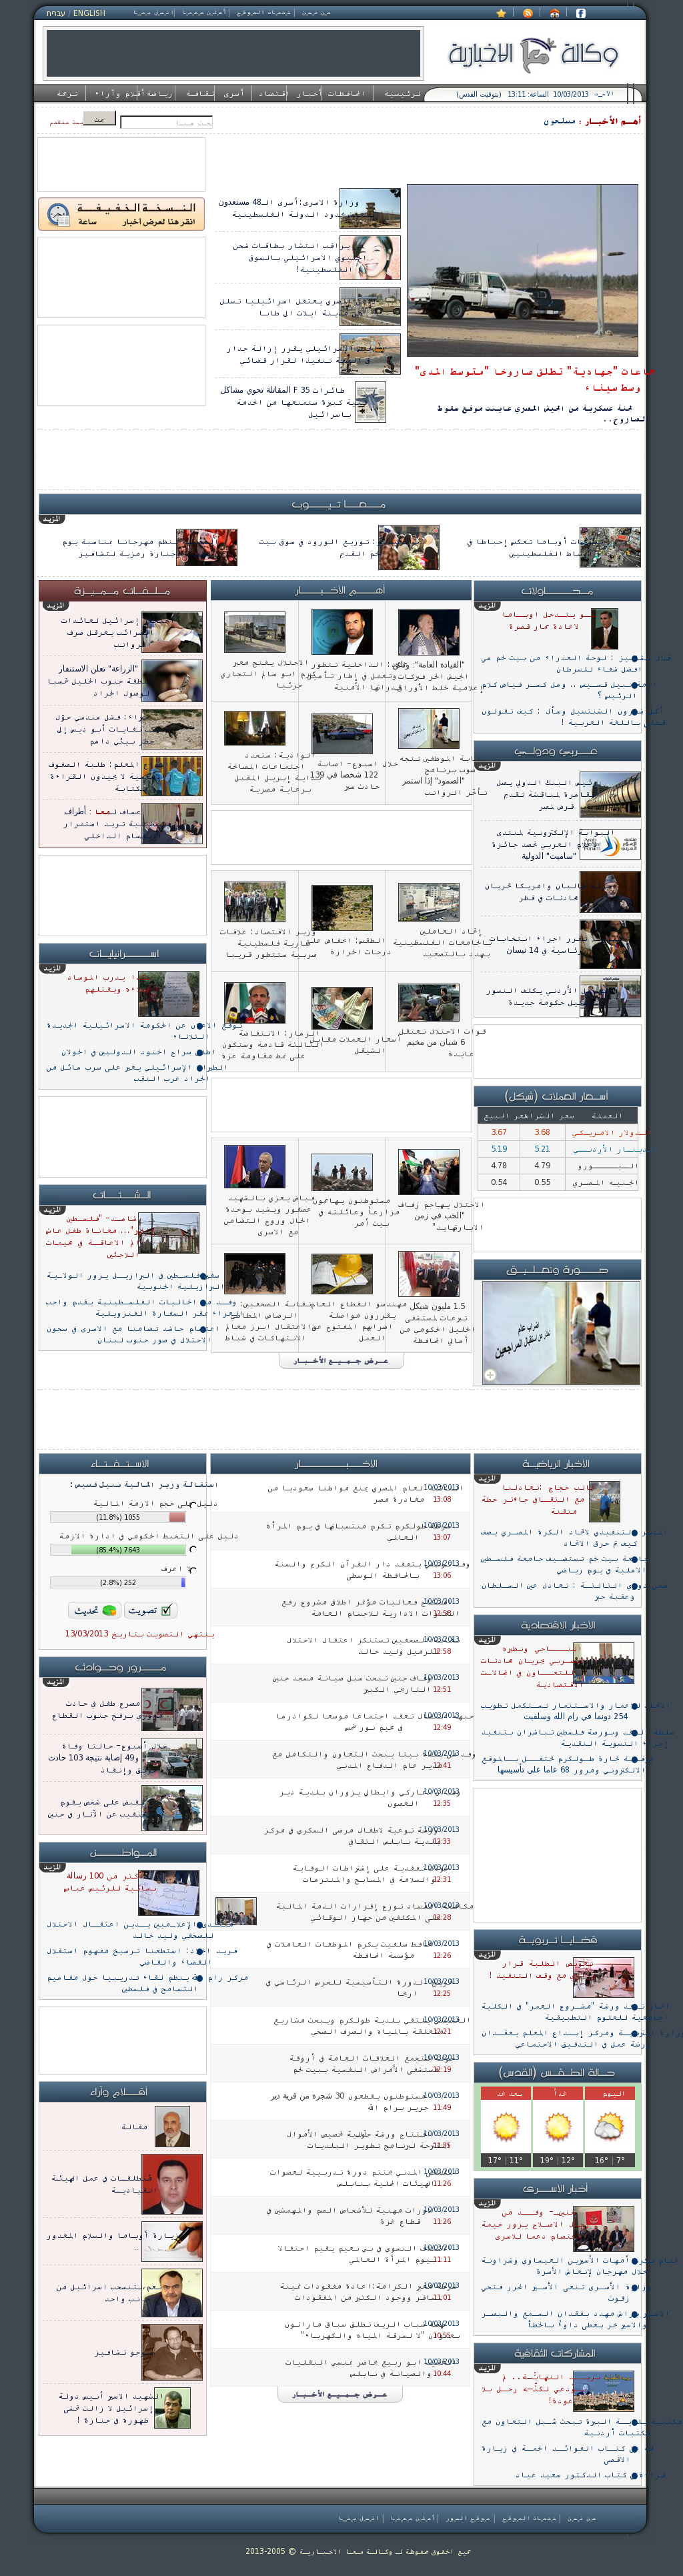 Ma'an News at Sunday March 10, 2013, 11:10 a.m. UTC